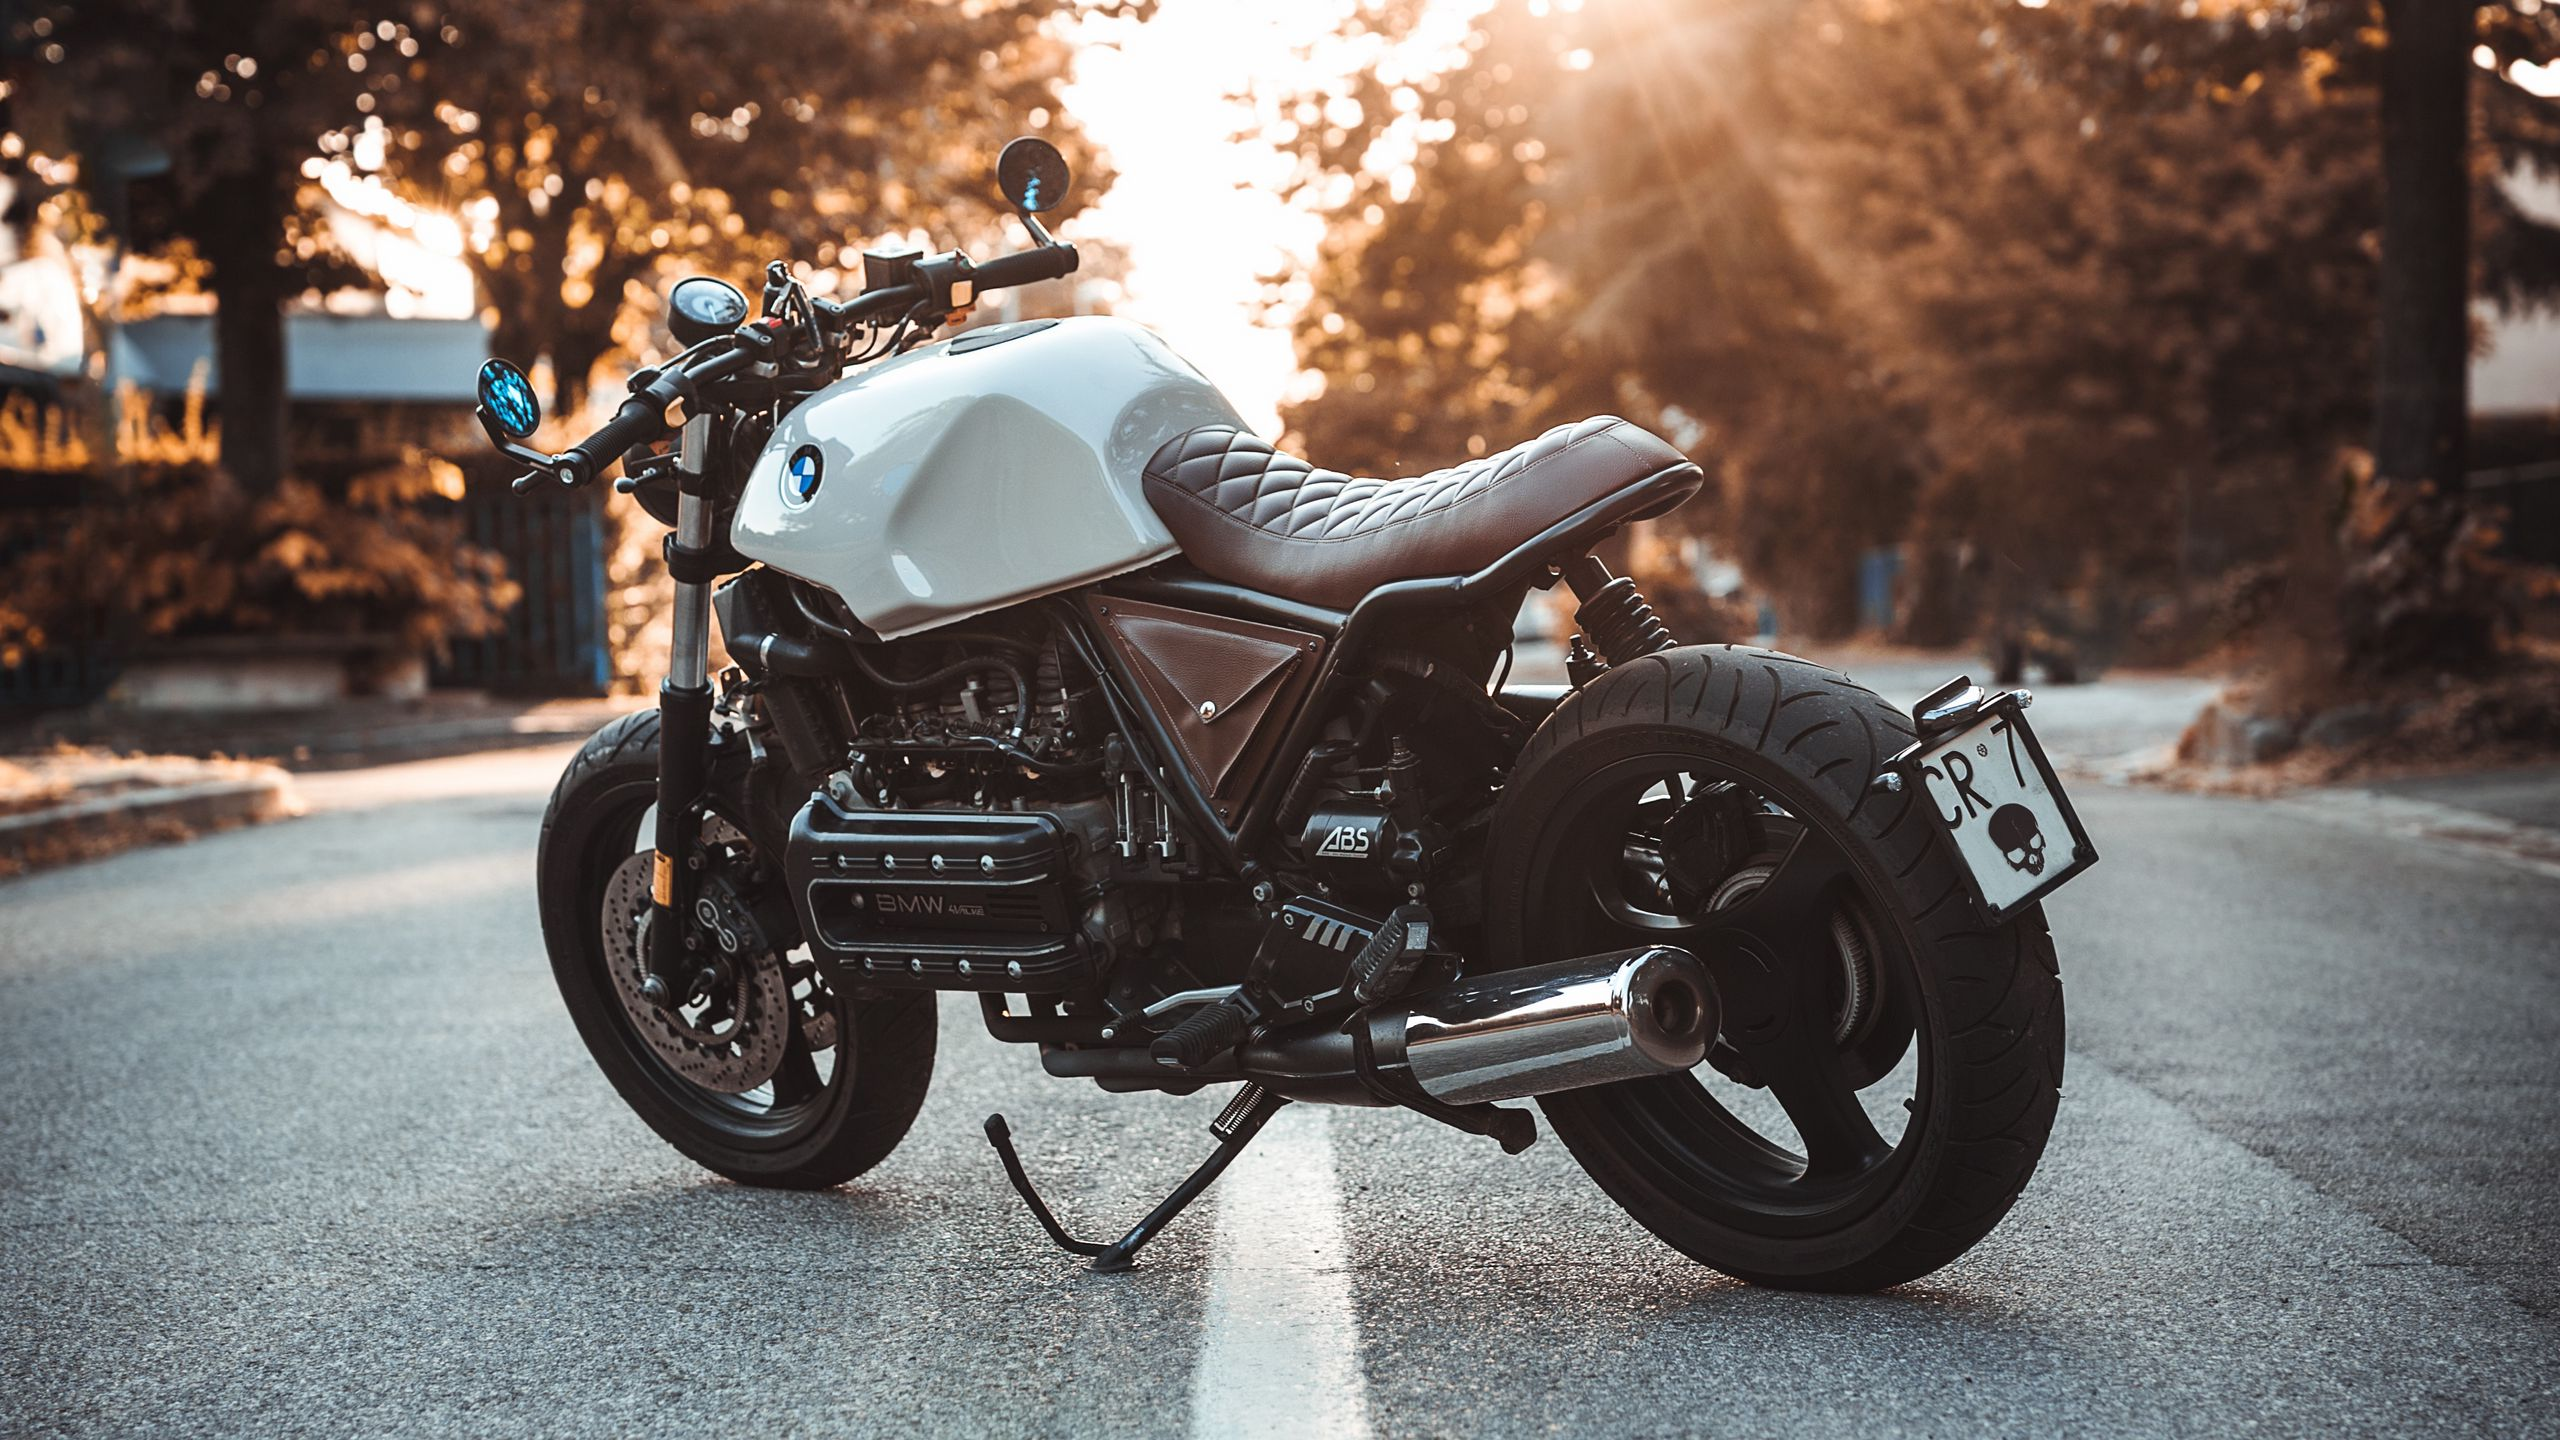 2560x1440 Обои bmw k100, мотоцикл, байк, вид сбоку